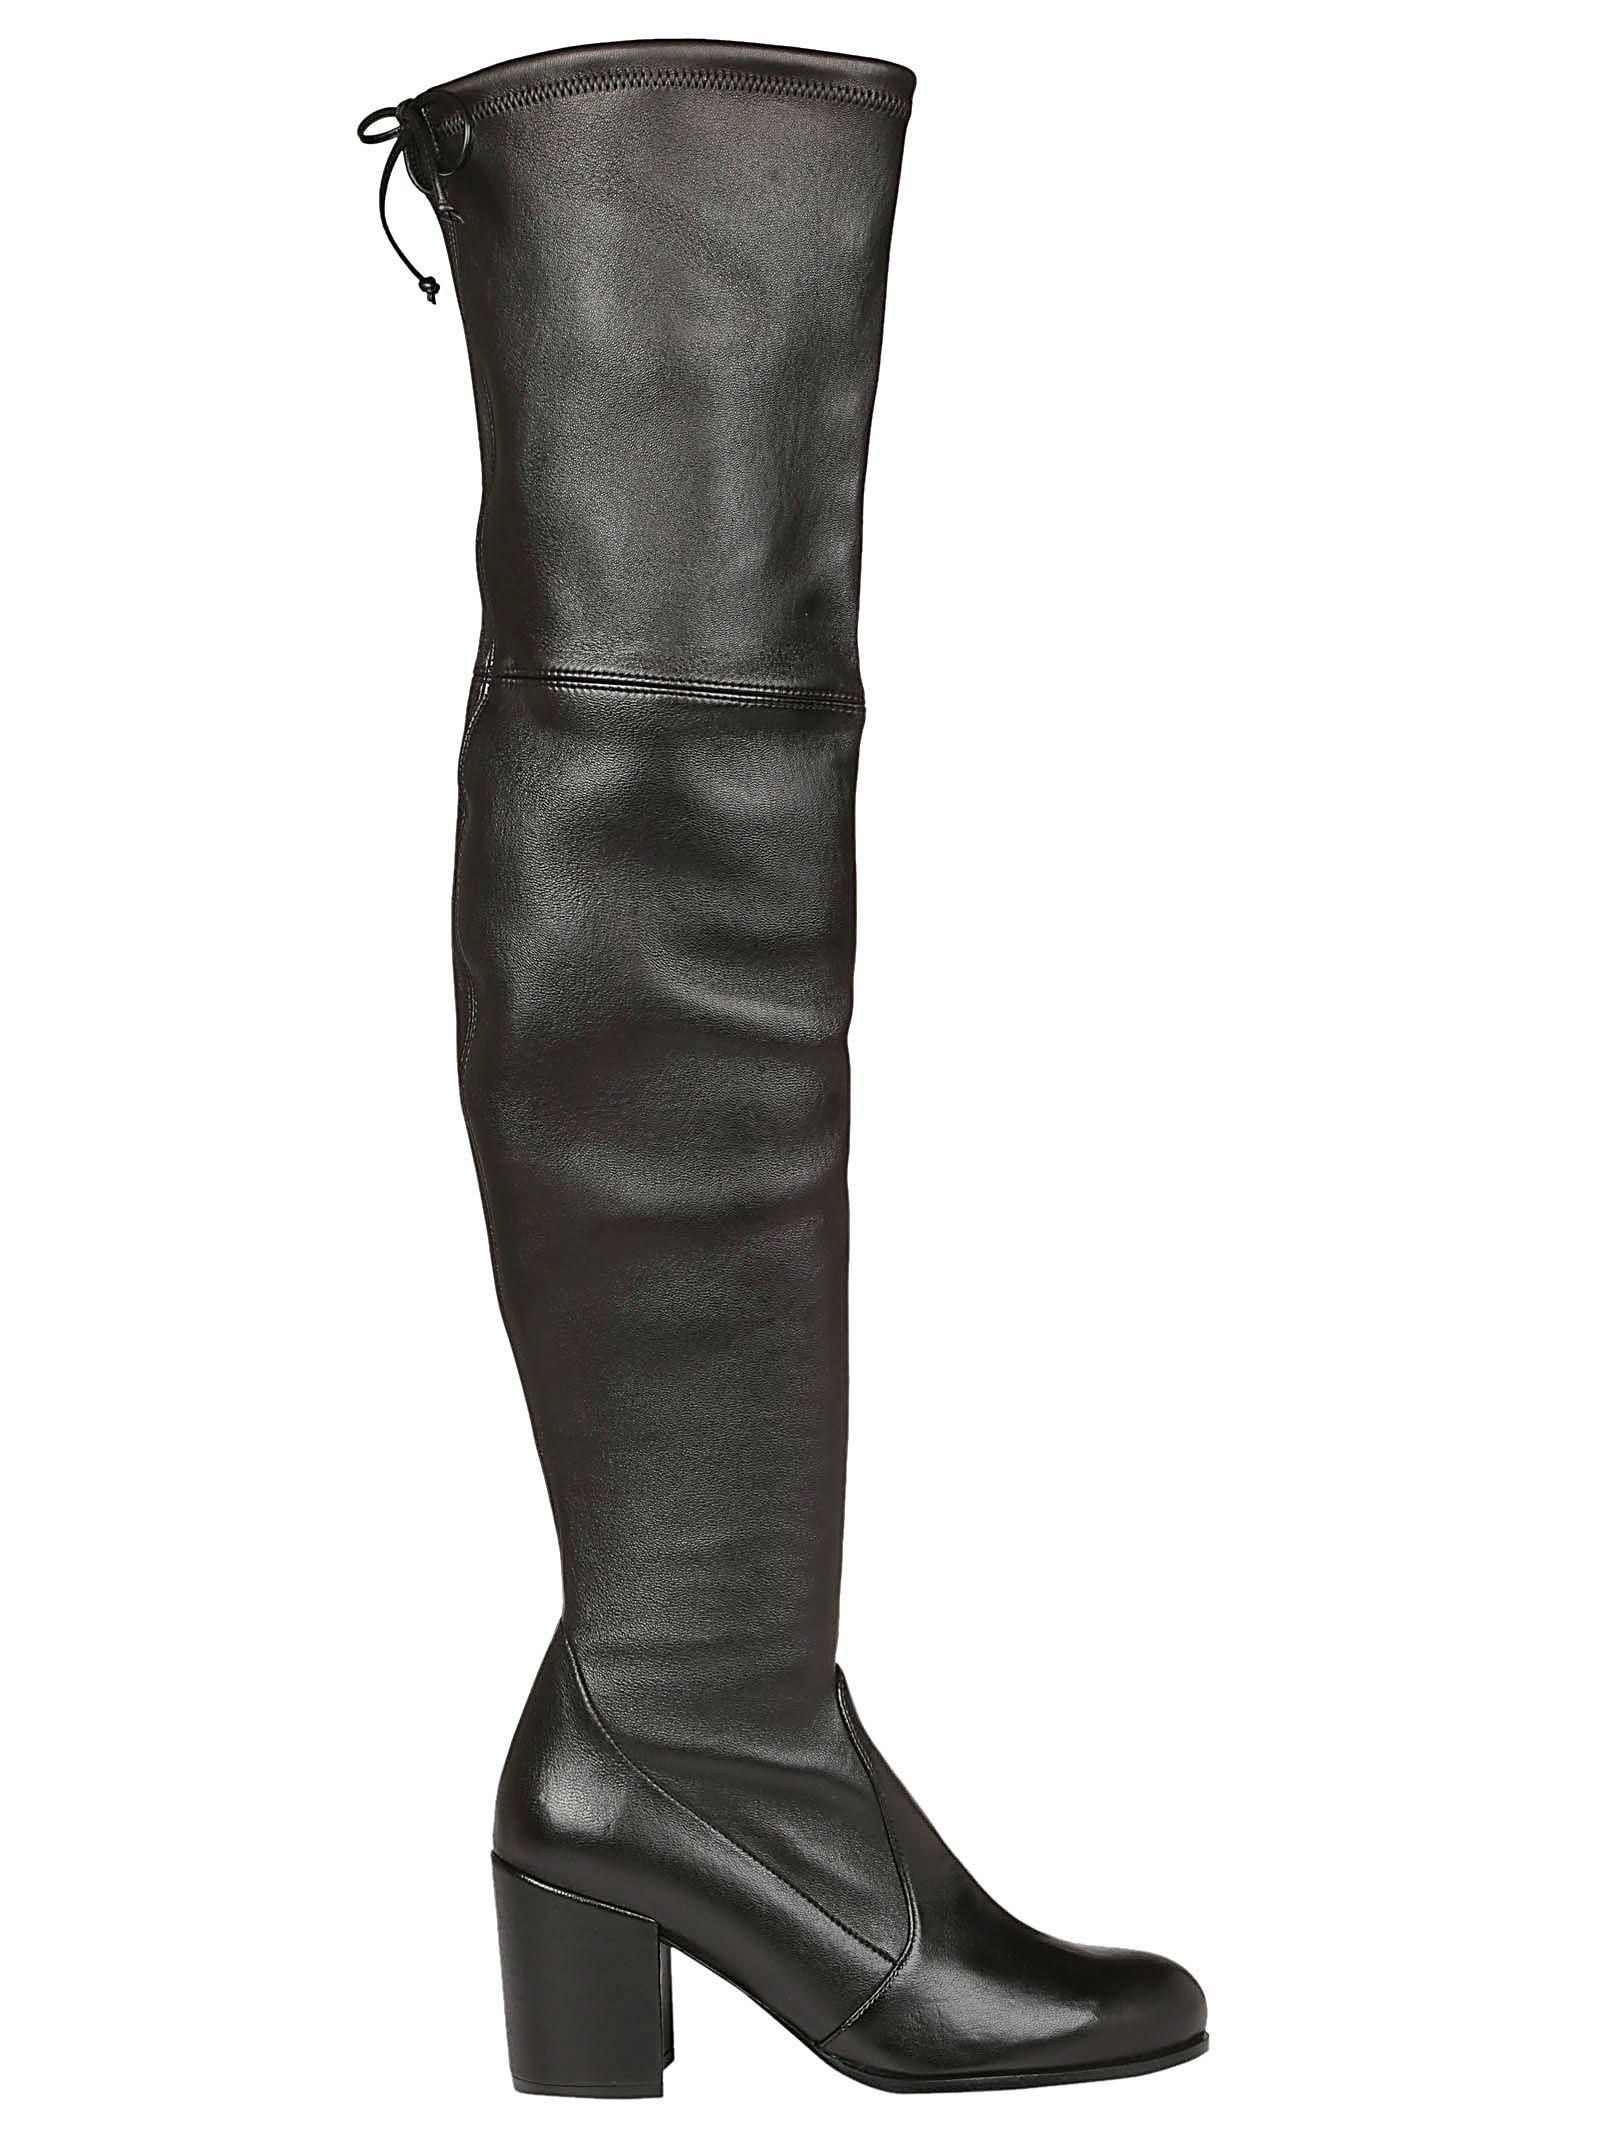 Tieland Boot, Black